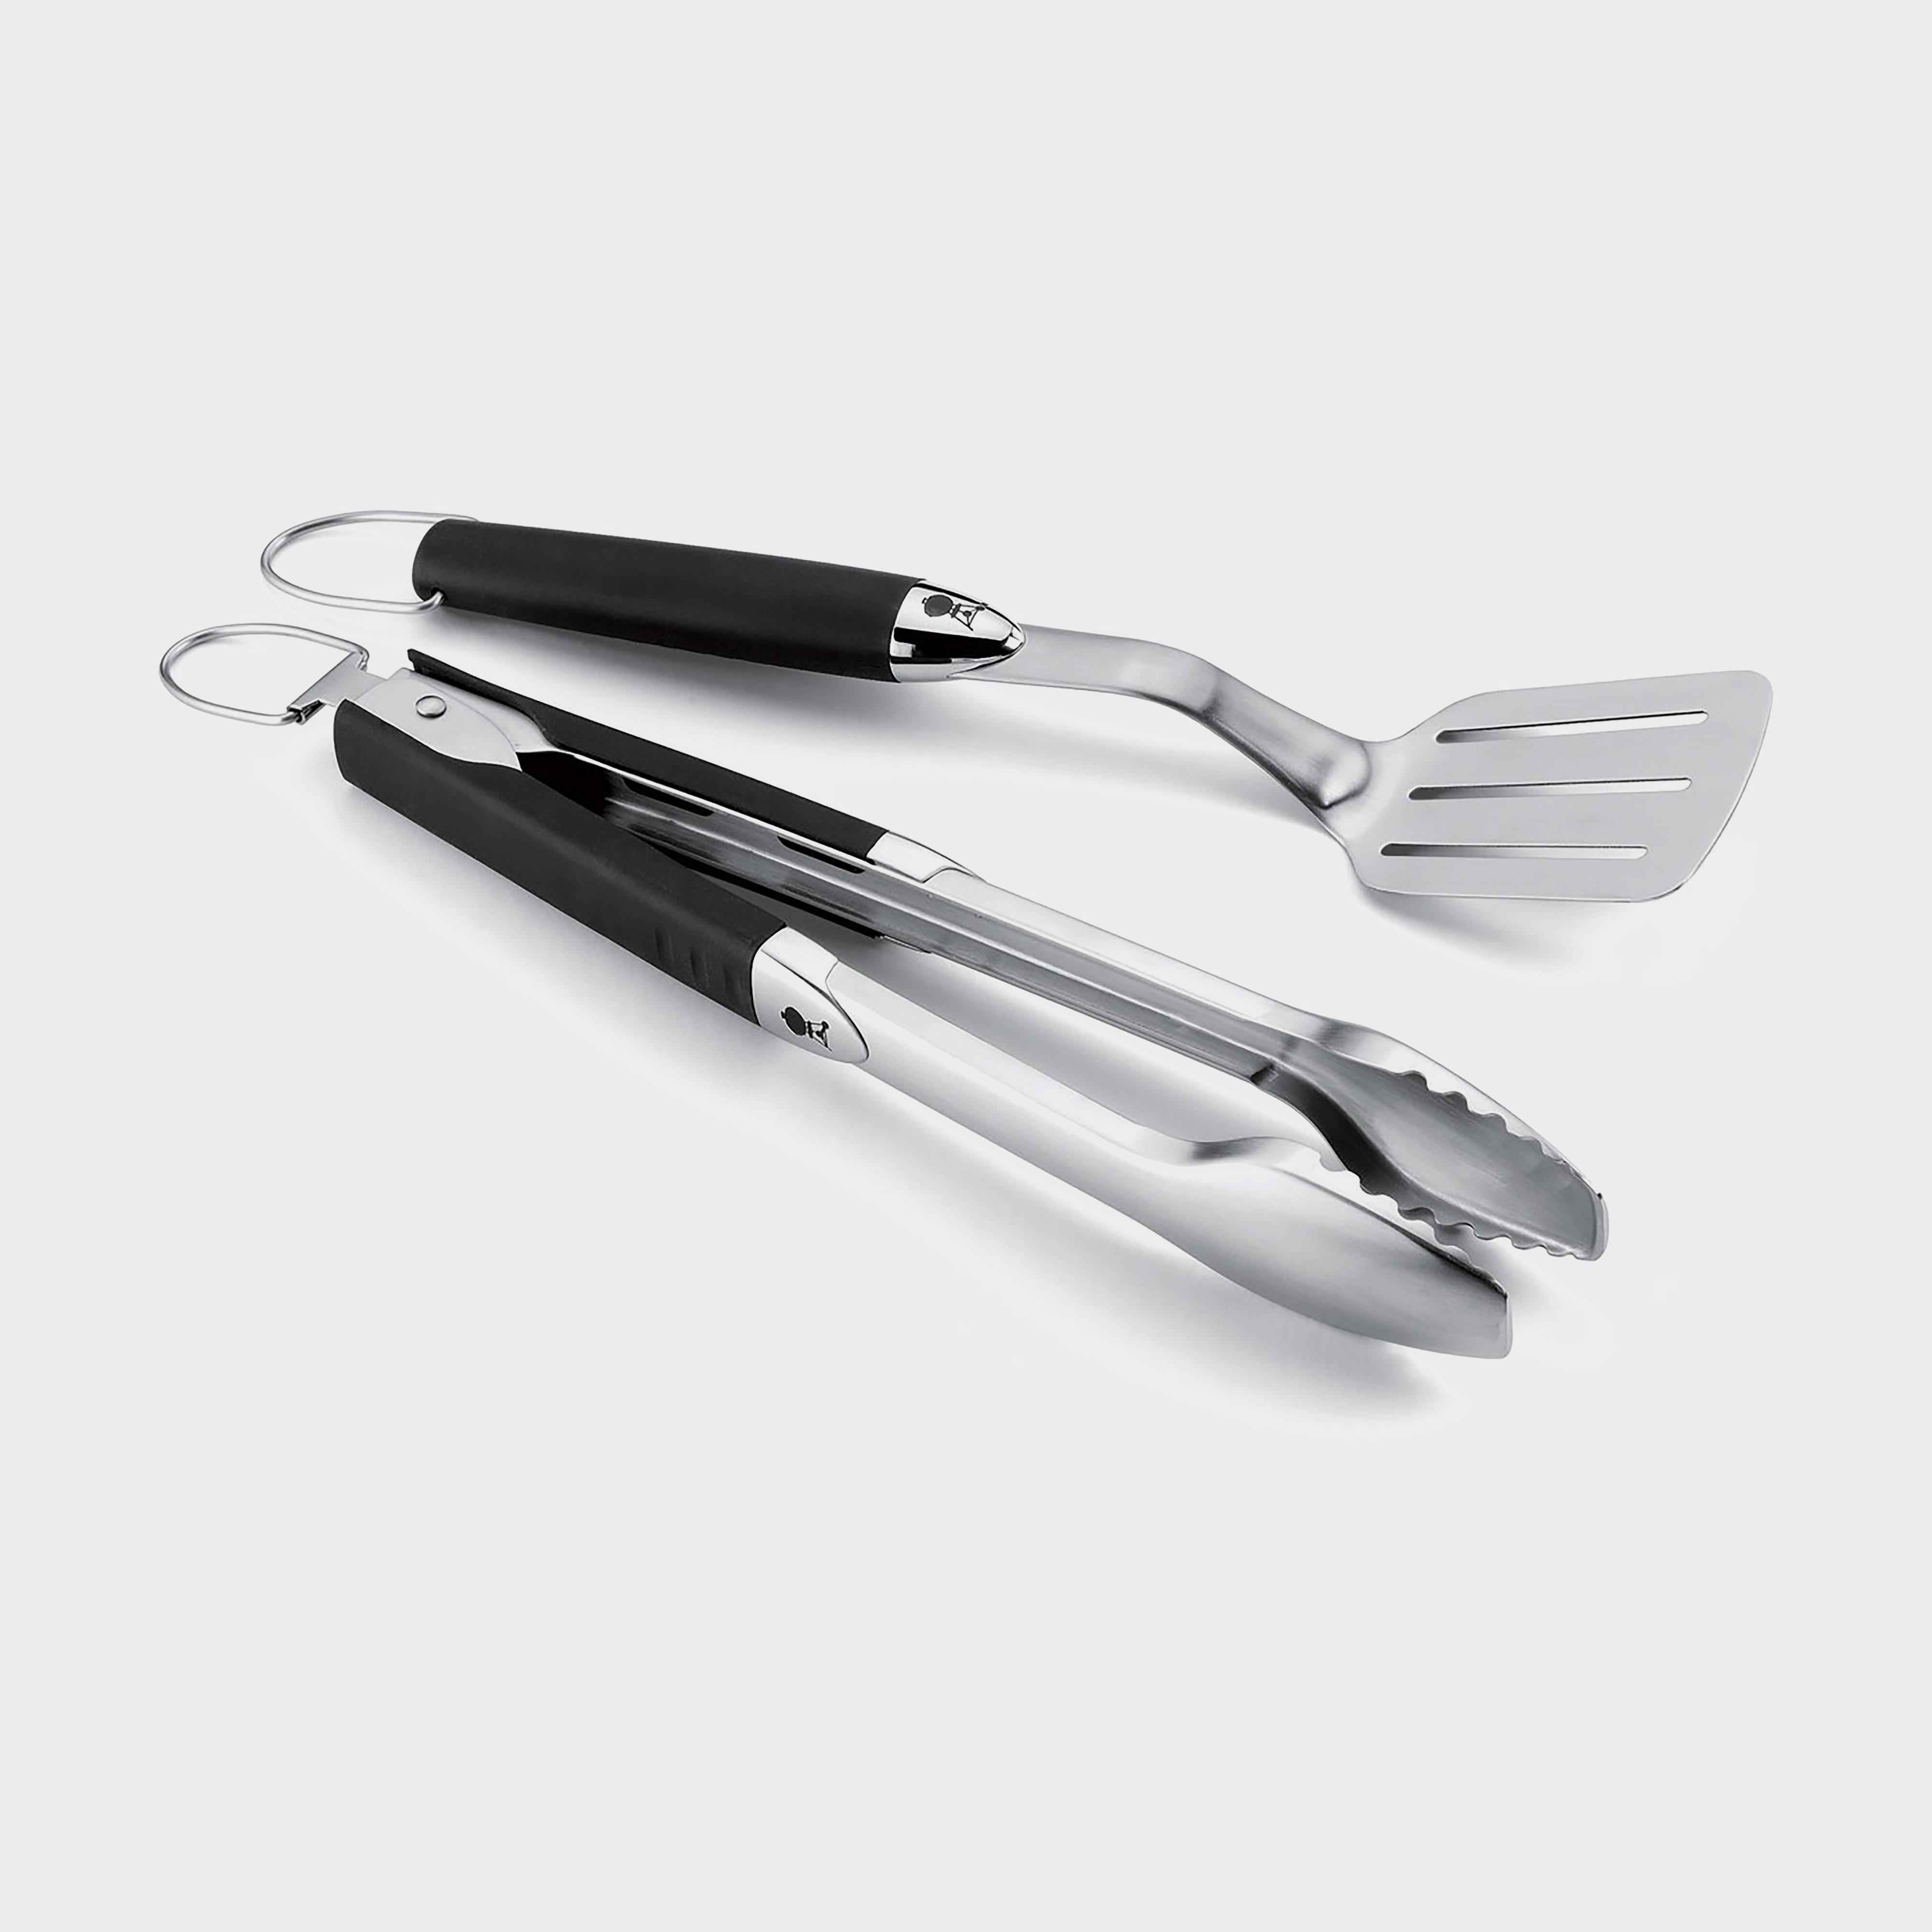 Weber Premium Tool Set - Black, Black